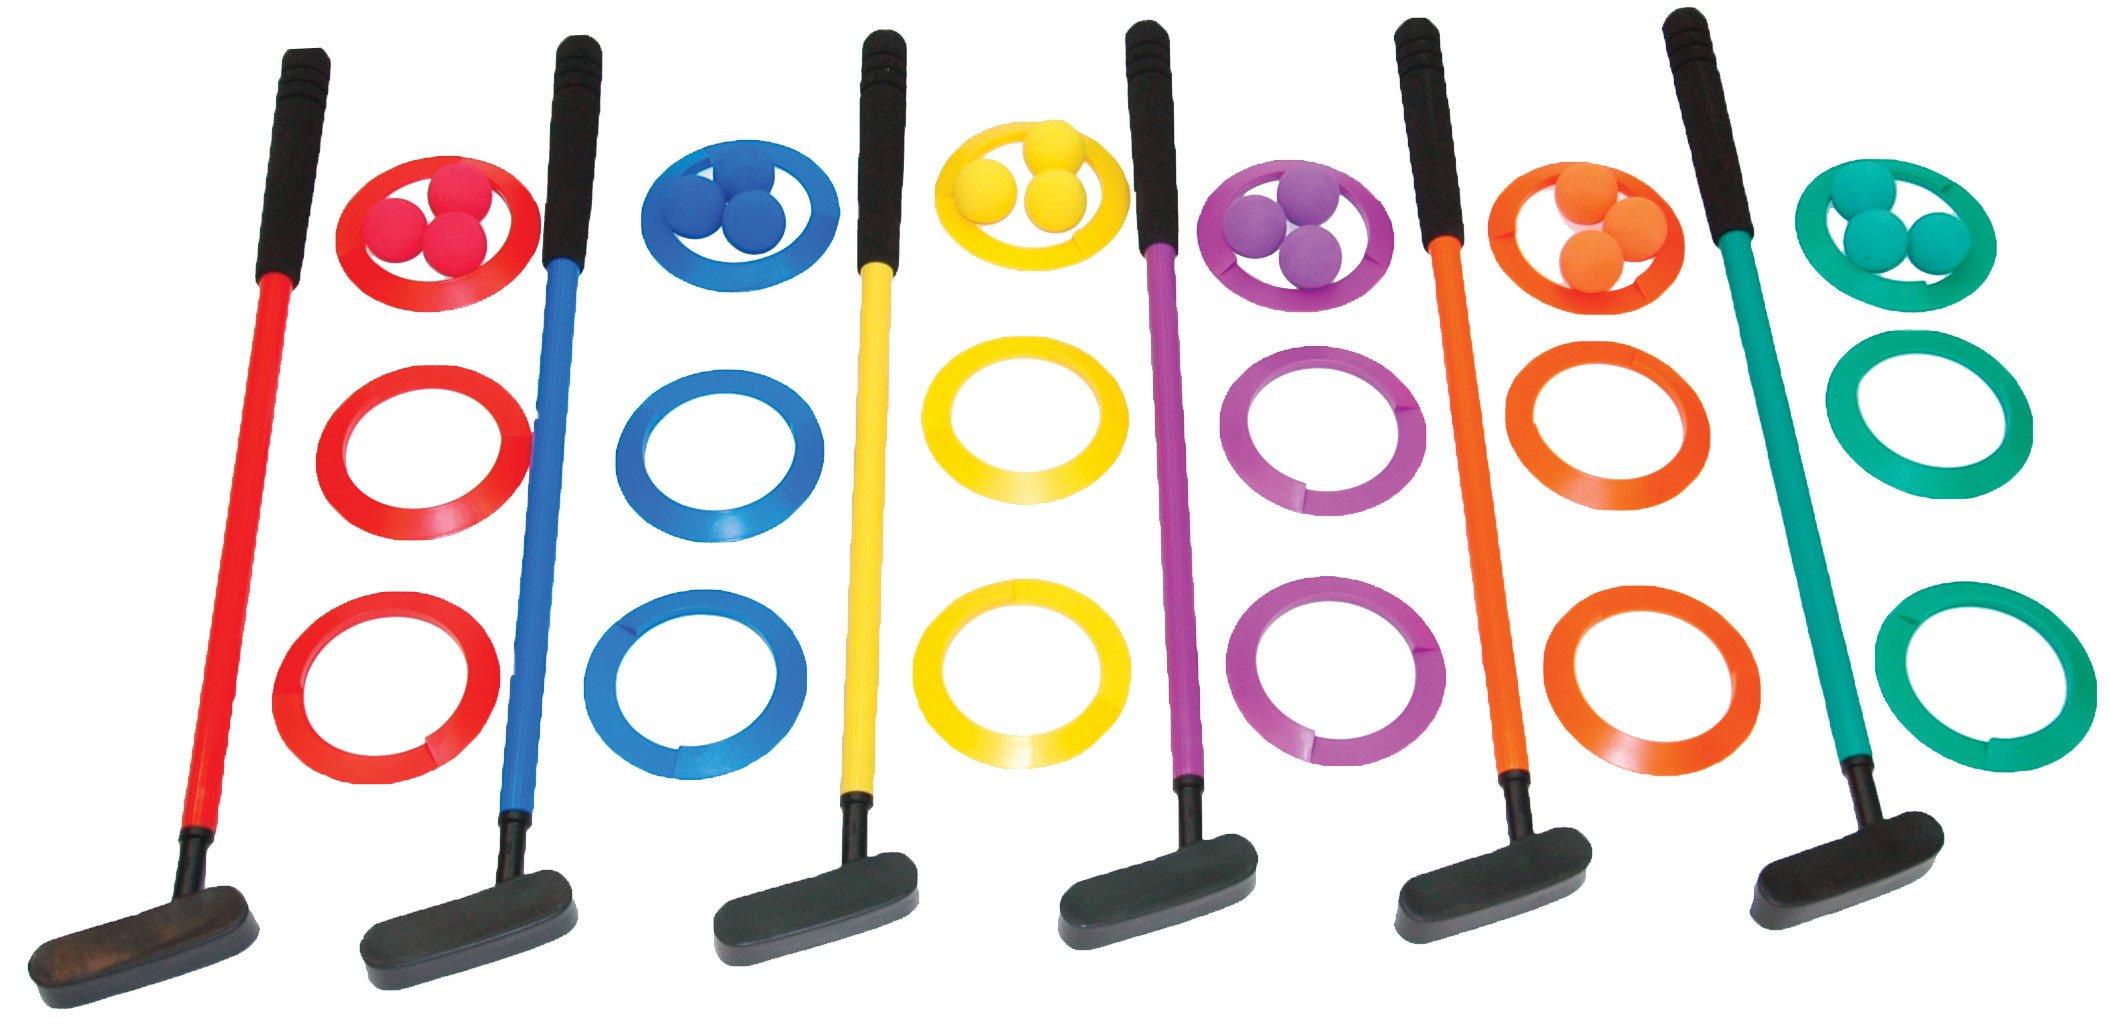 Champion Sports Mini Golf Clubs: Multi Colored Putt Putt Miniature Golfing Set For Kids - 6 Putters 18 Holes & 18 Balls